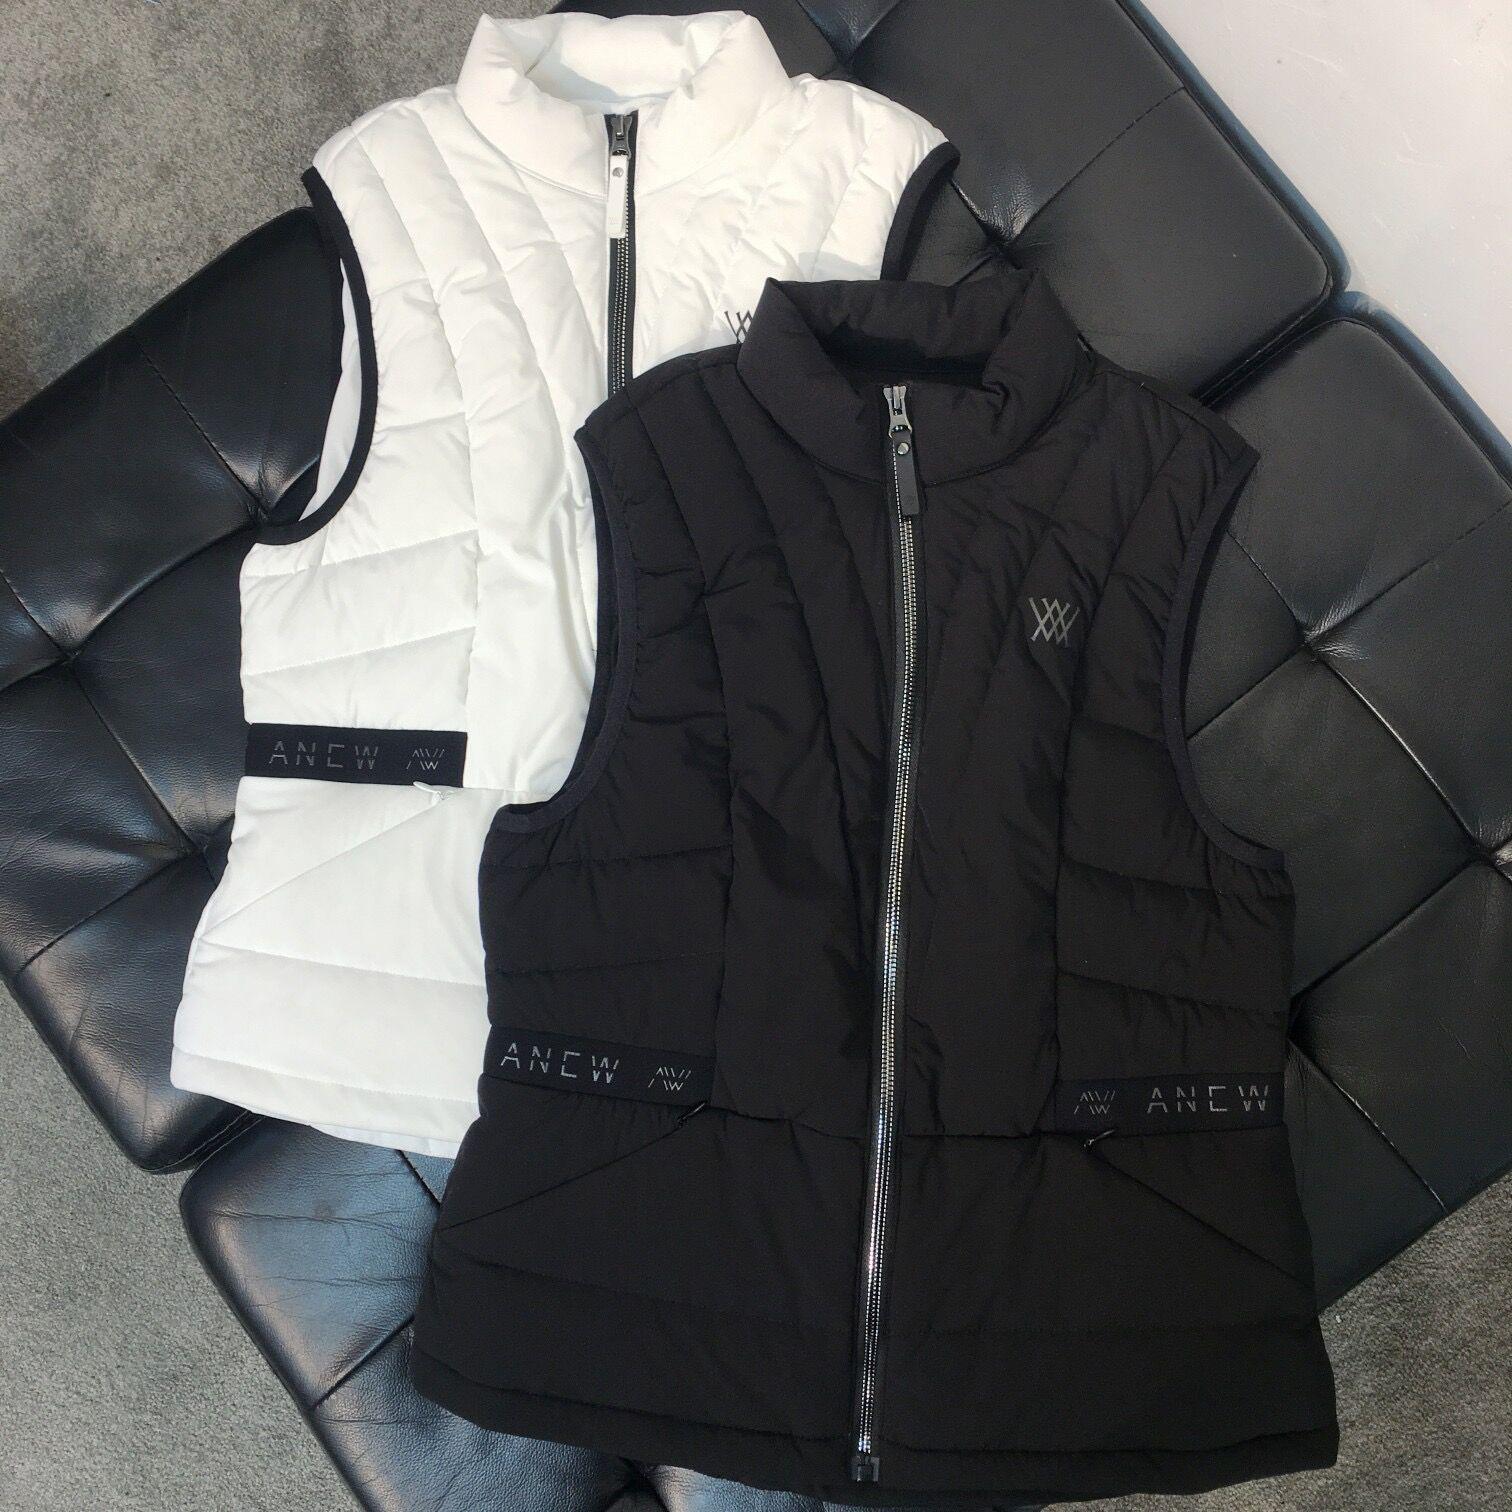 A-NEW Golf Clothing Fashion Slim Women's Down Jacket Vest